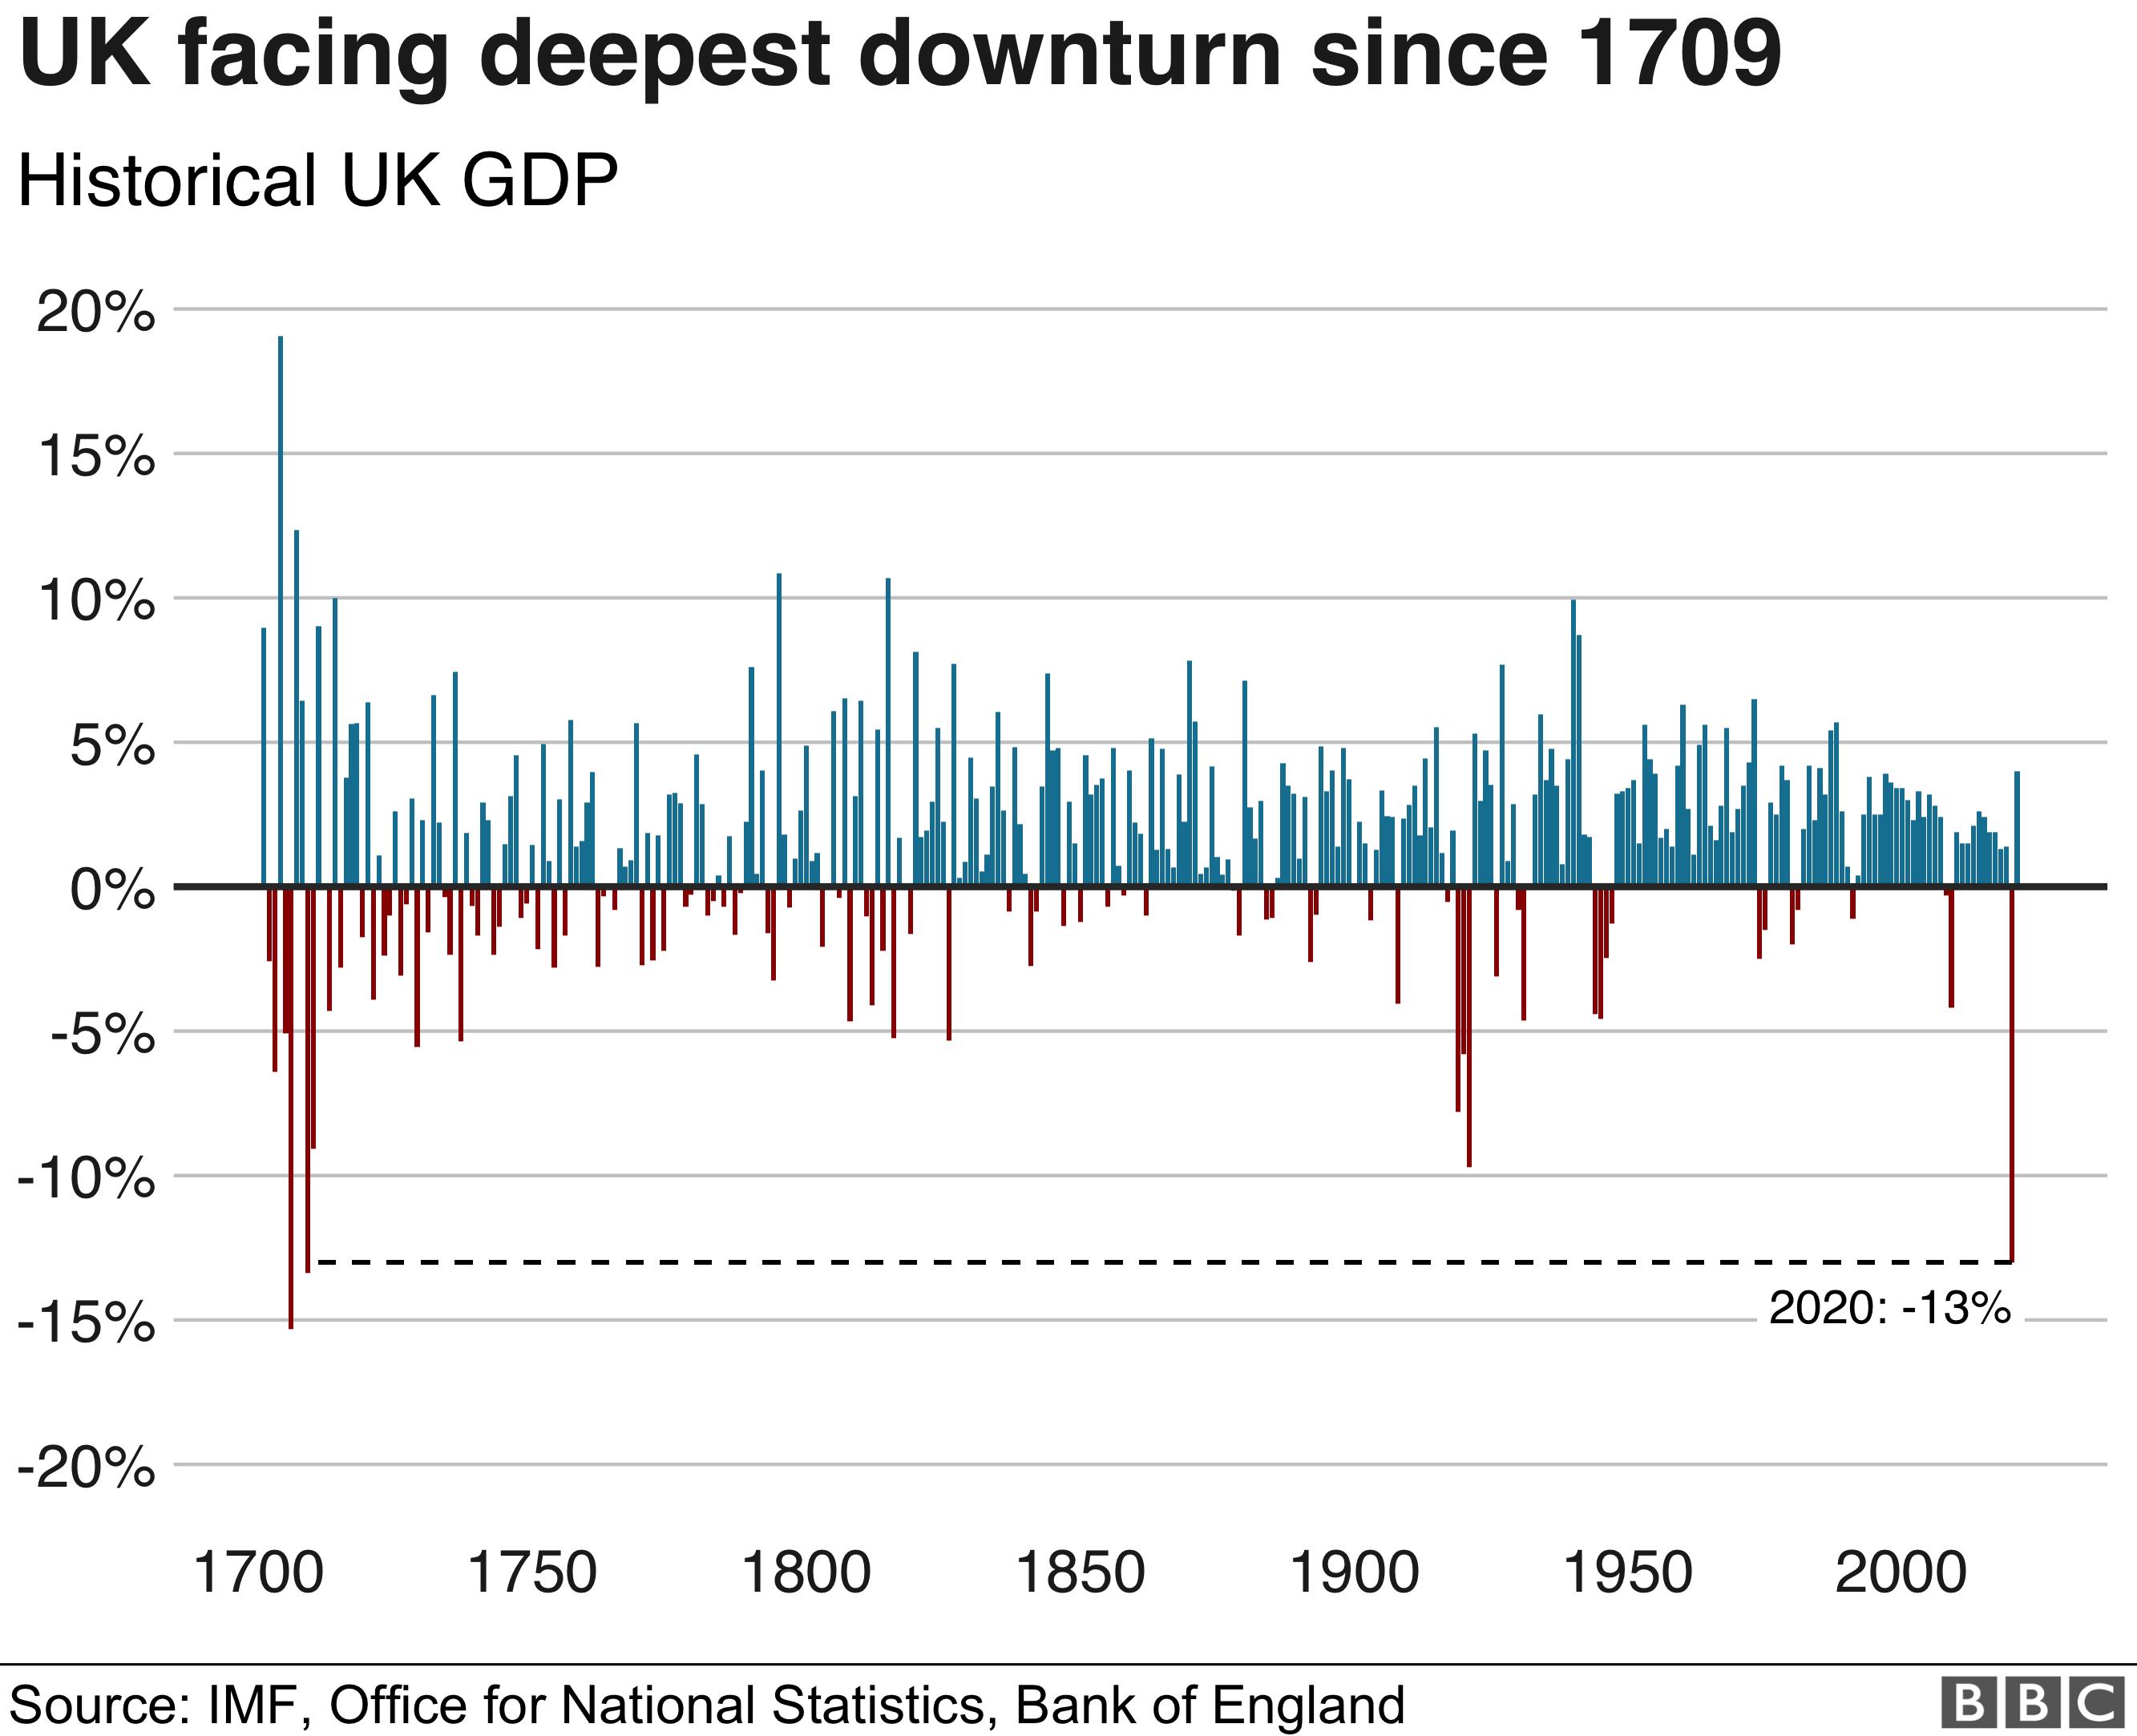 UK facing deepest downturn since 1709